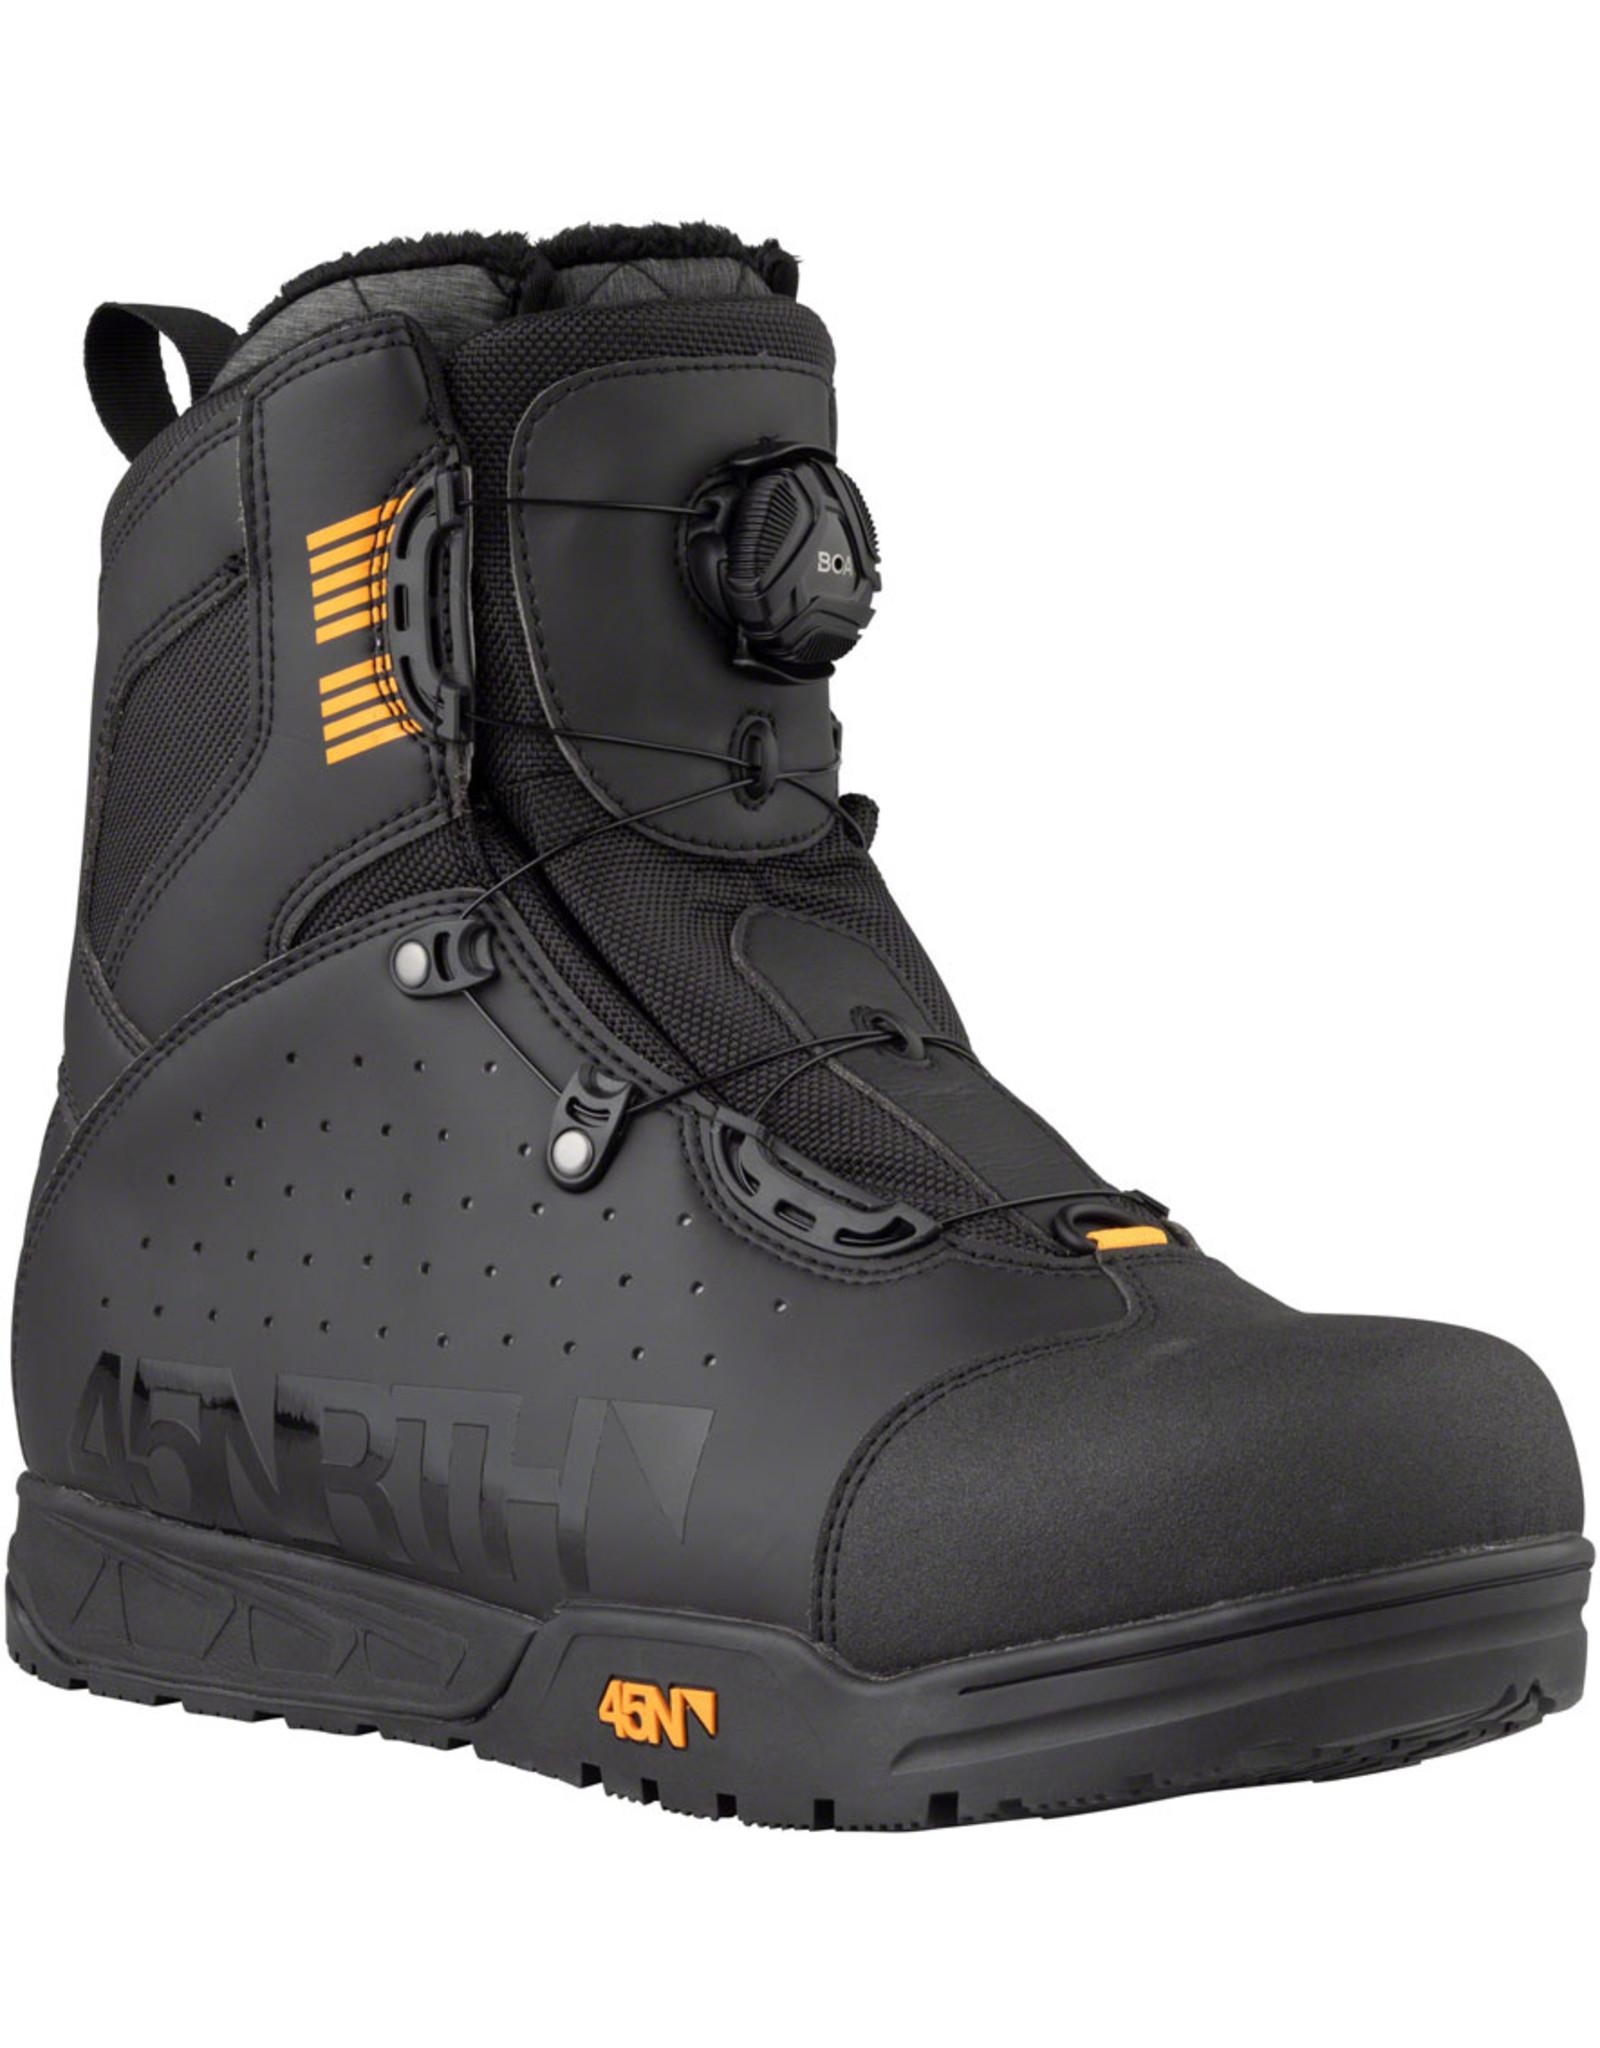 45NRTH 45NRTH Wolvhammer Cycling Boot: BOA Closure, Black, Size 43